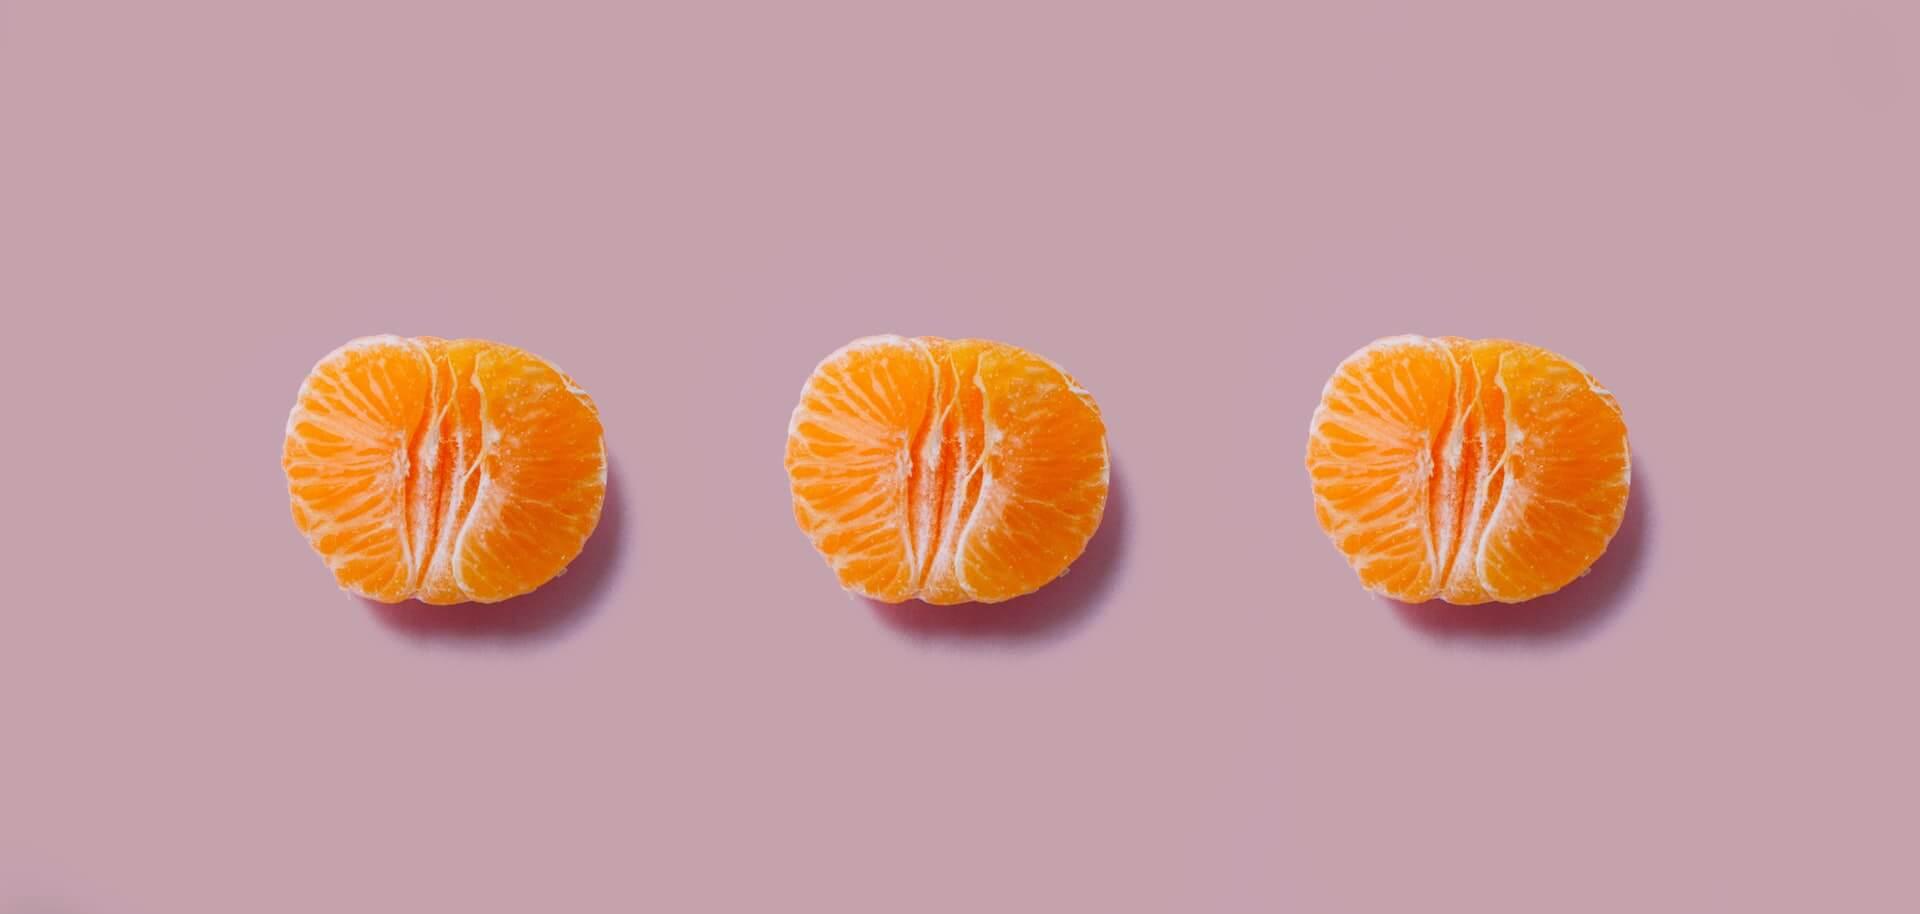 segments of an orange